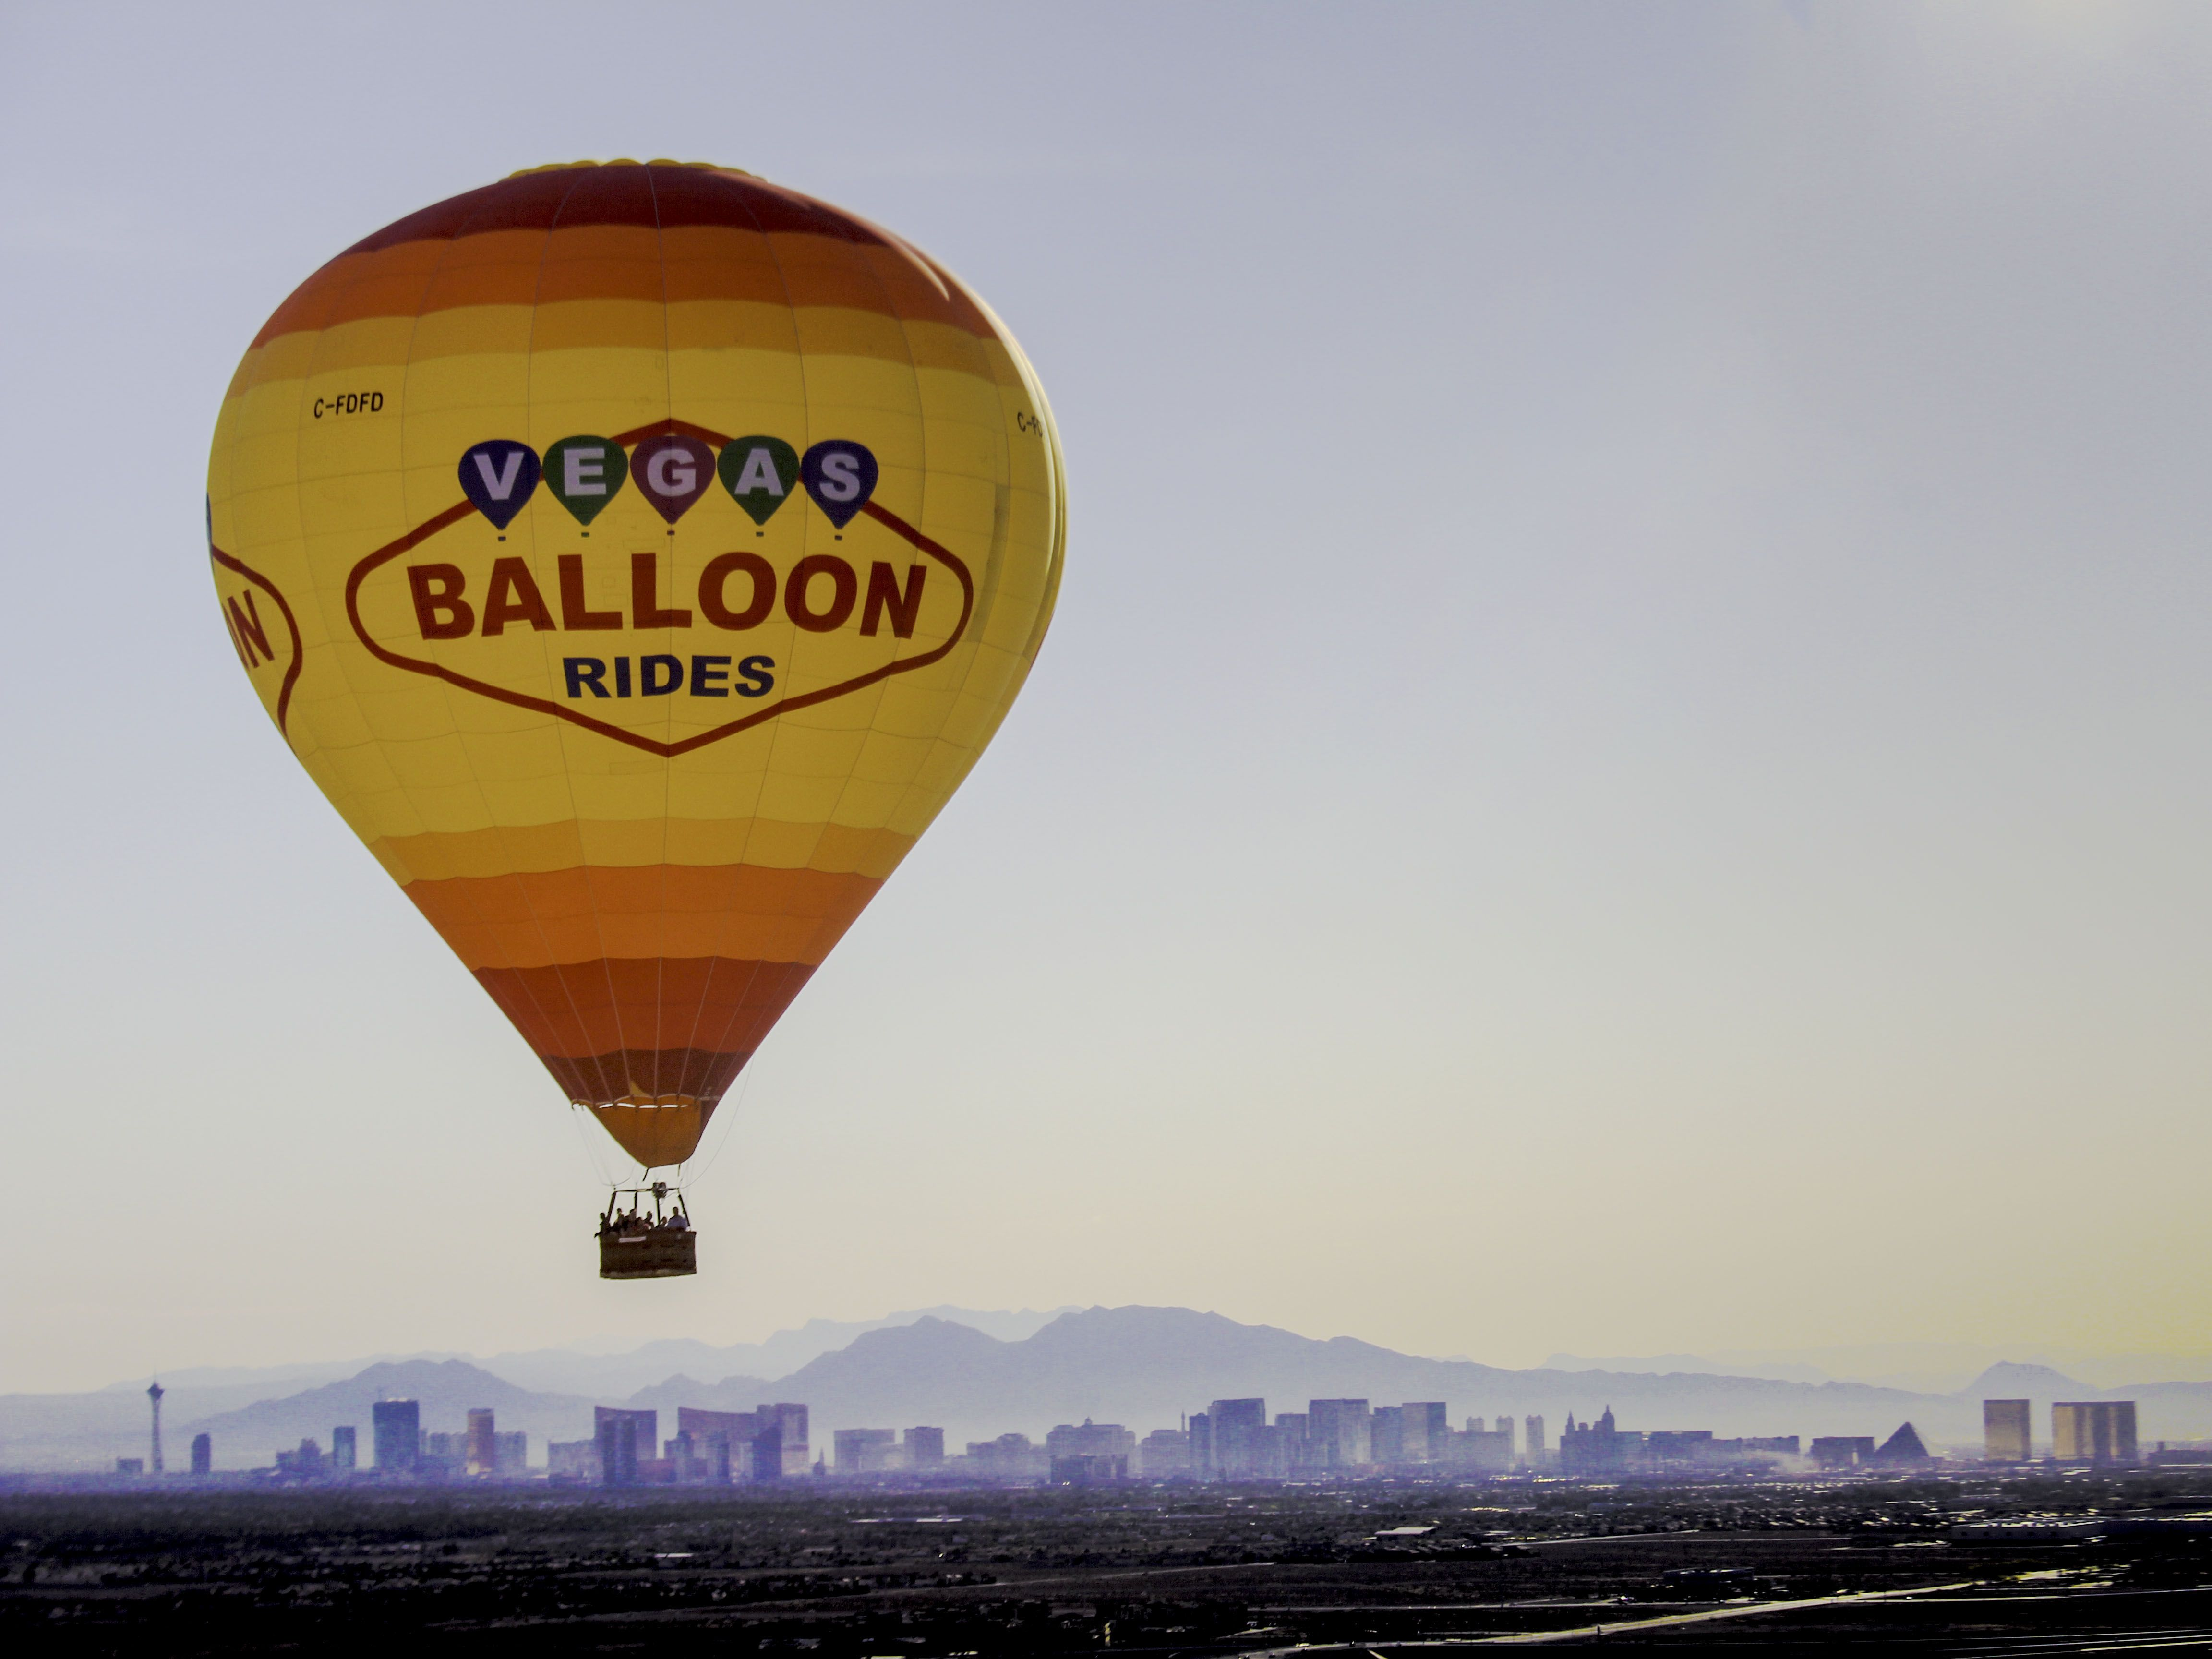 Las Vegas Hot Air Balloon